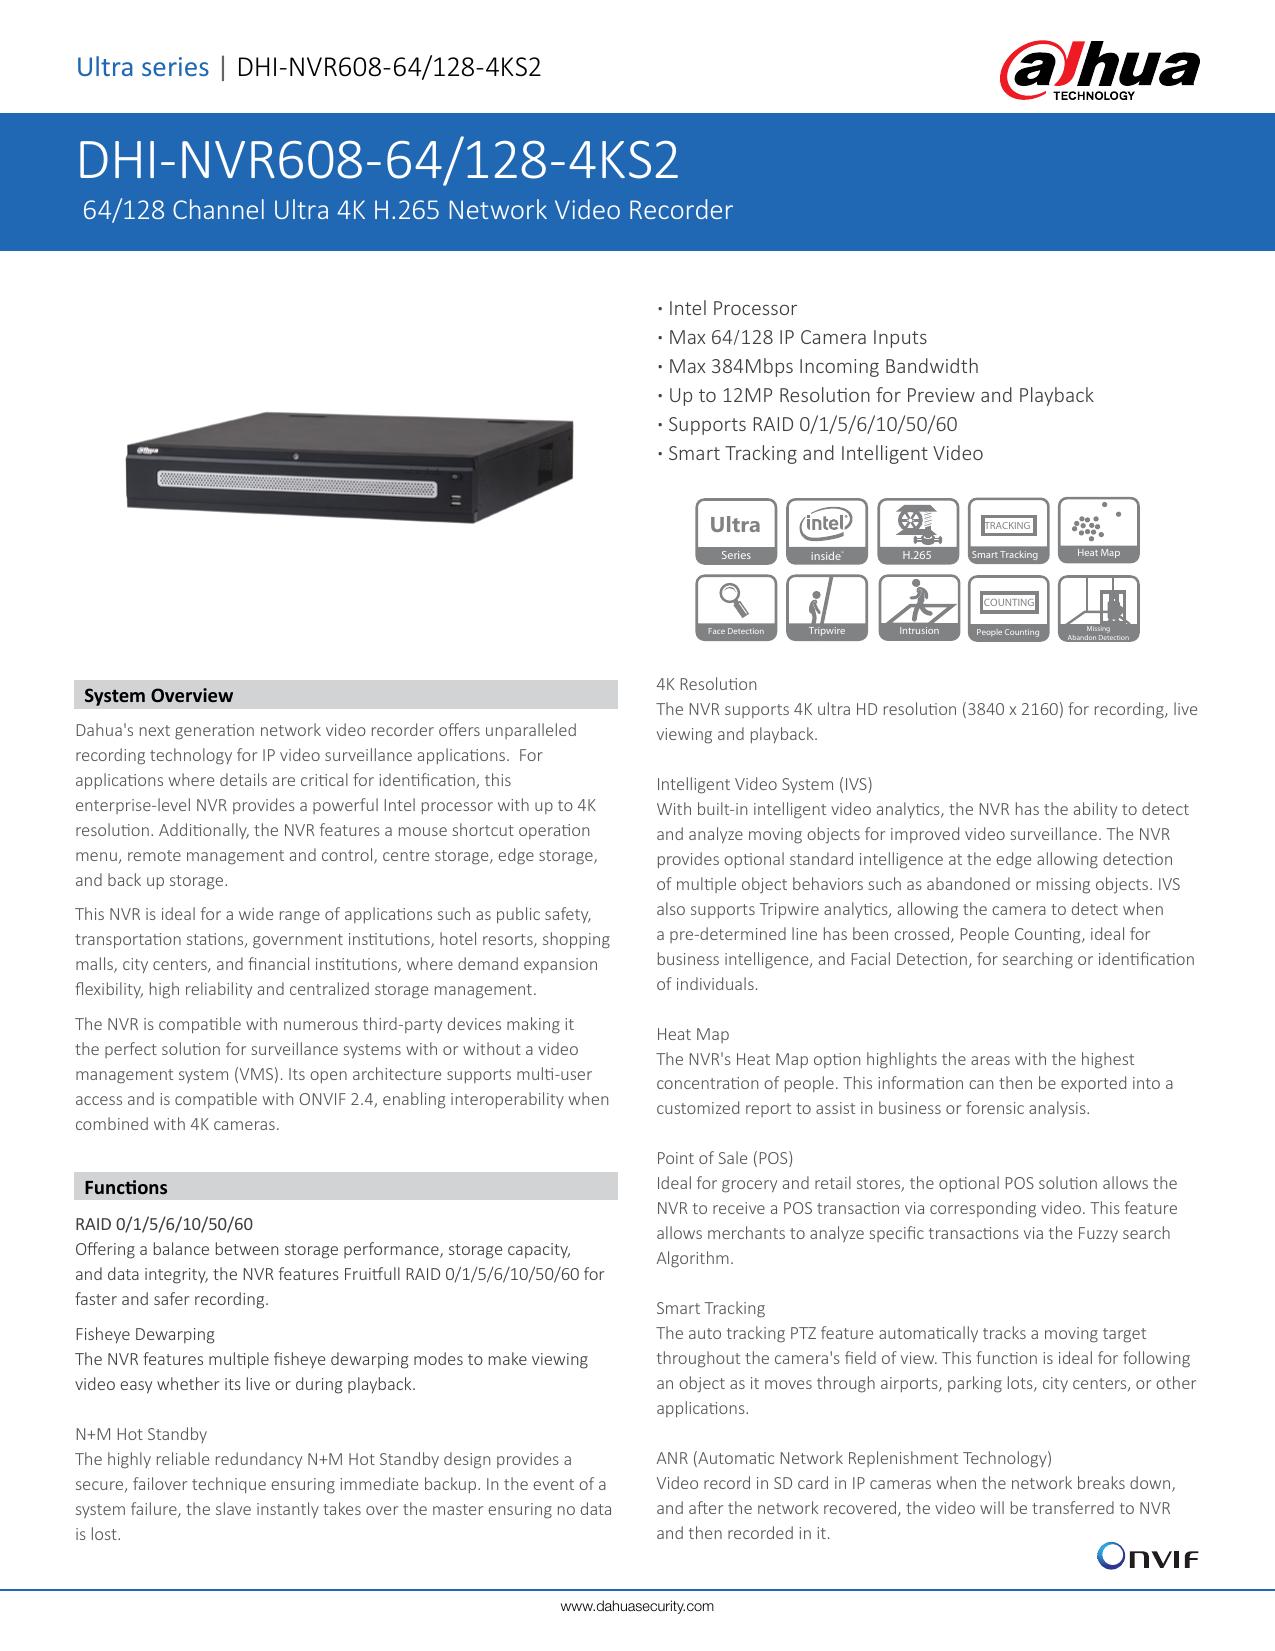 Dahua NVR608-128-4KS2 128 Channel Ultra 4K H.265 Smart Tracking ...